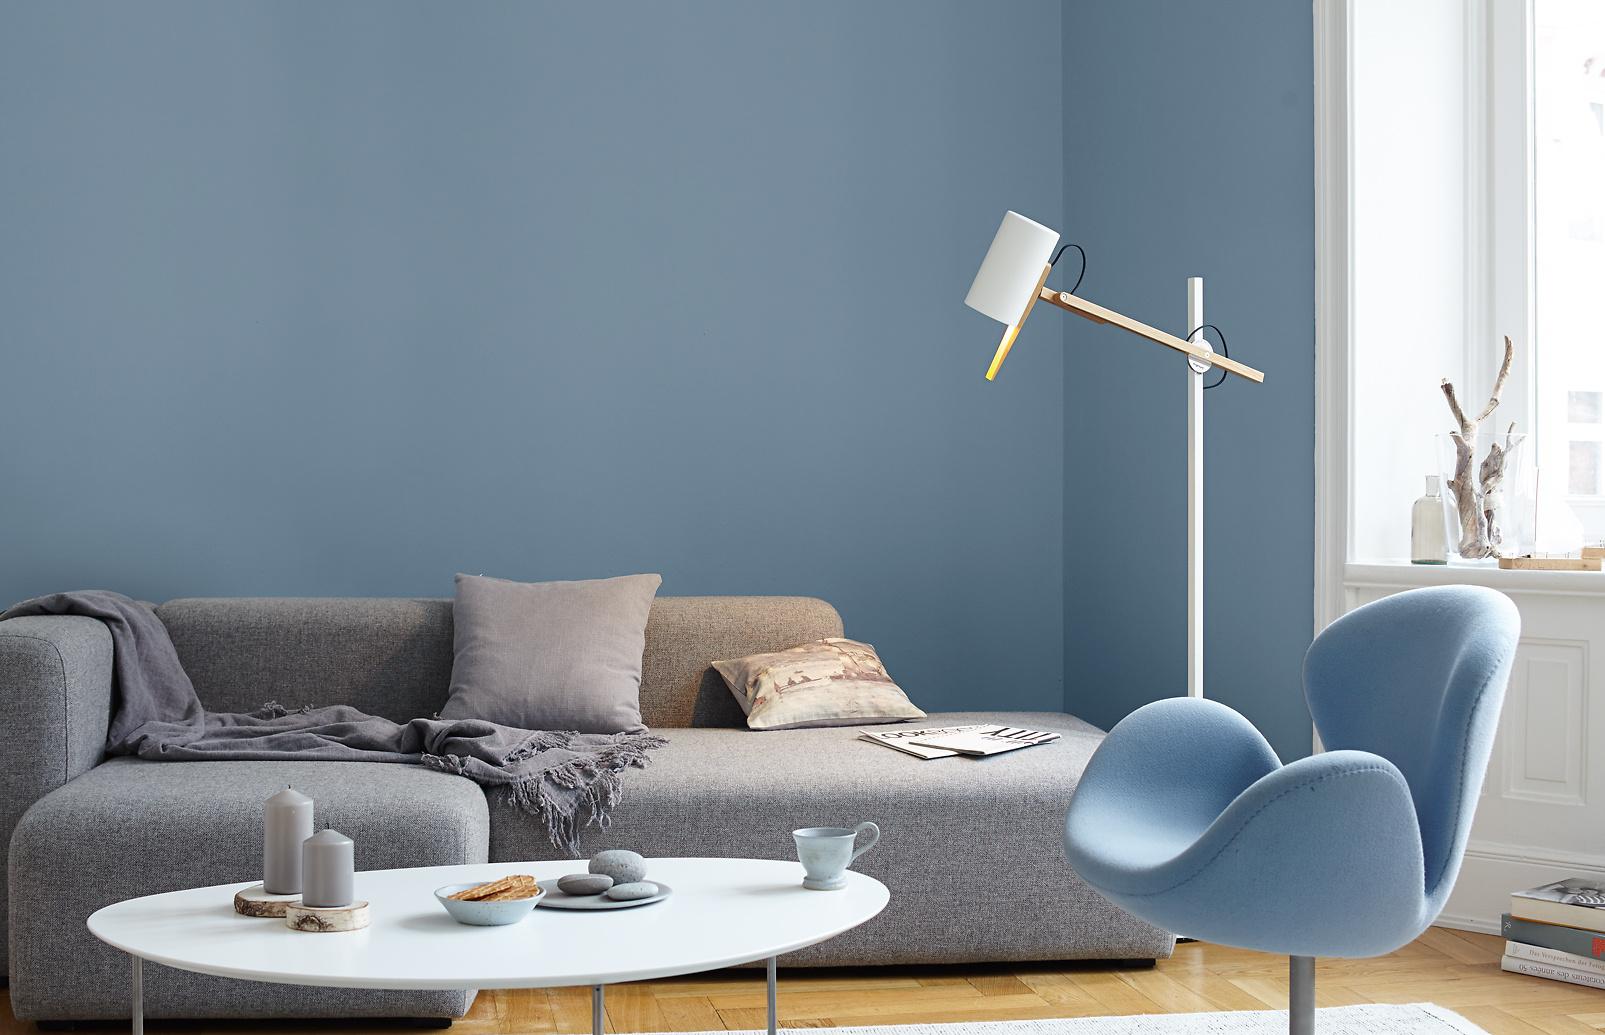 Premium Wandfarbe Blau Graublau Alpina Feine Farben Ruhe Des Nordens Alpina Farben